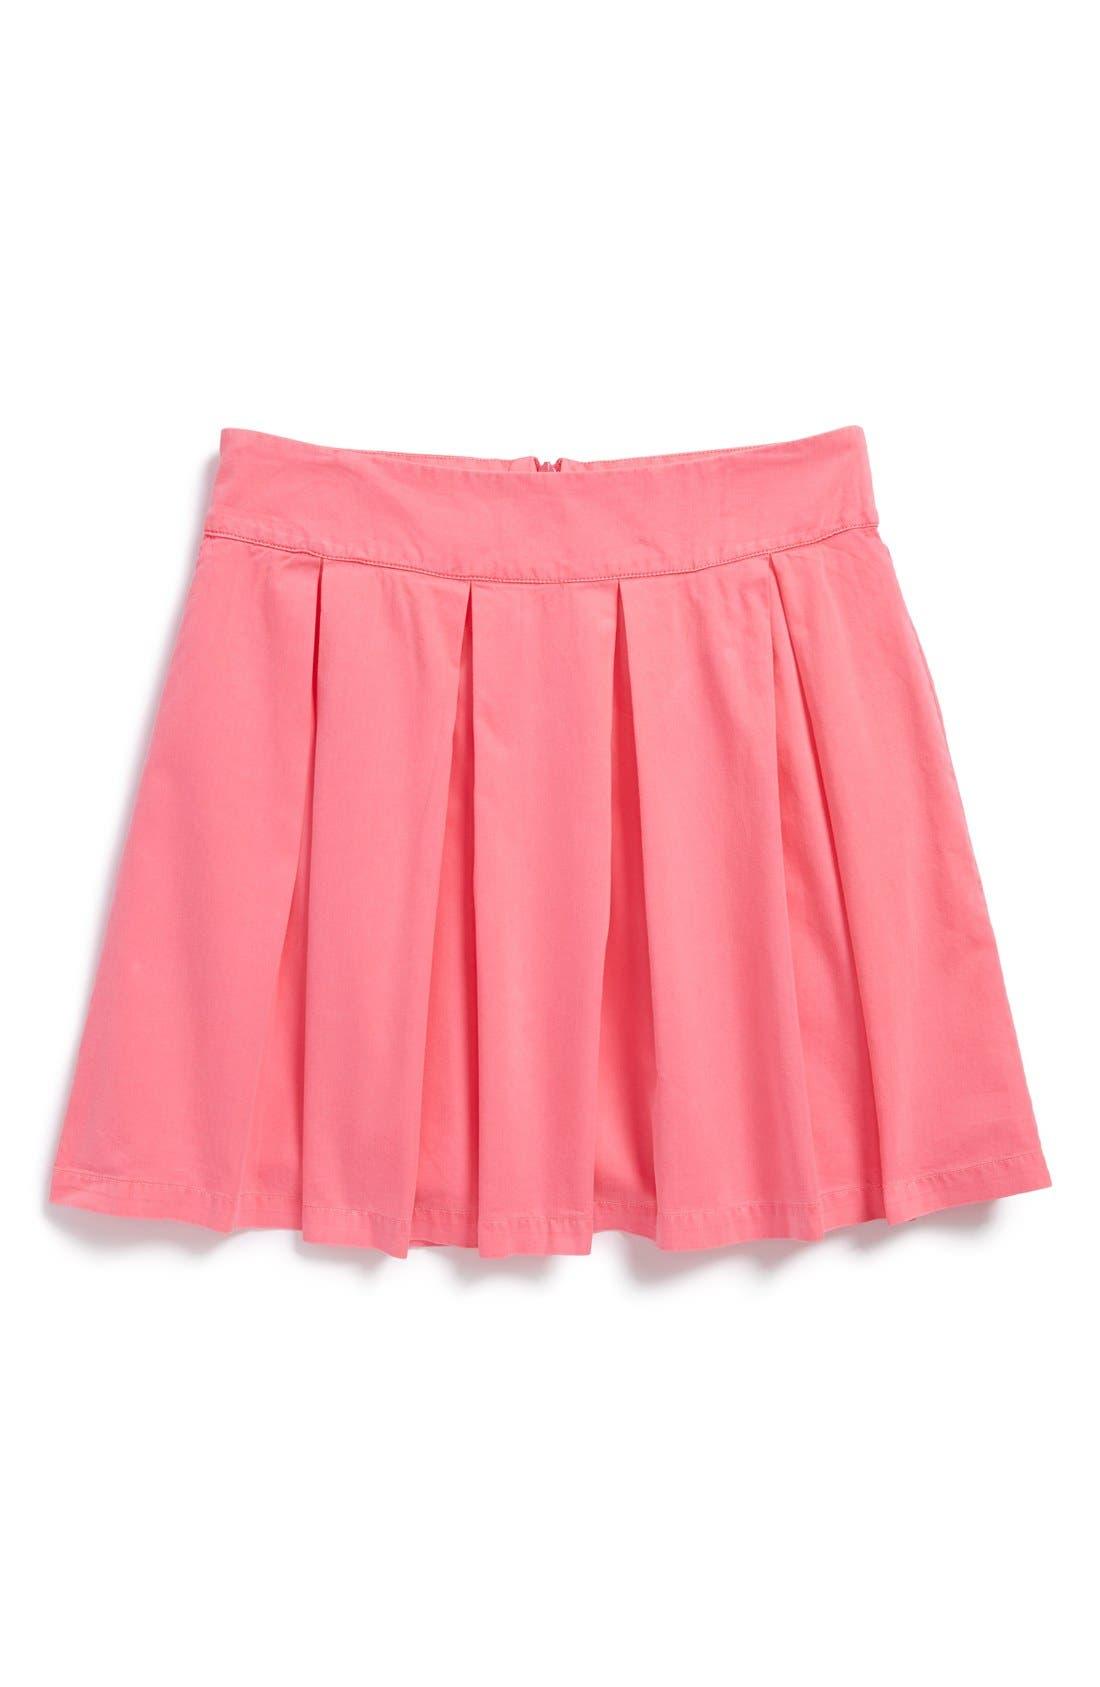 Alternate Image 1 Selected - Ruby & Bloom 'Ingrid' Skirt (Big Girls)